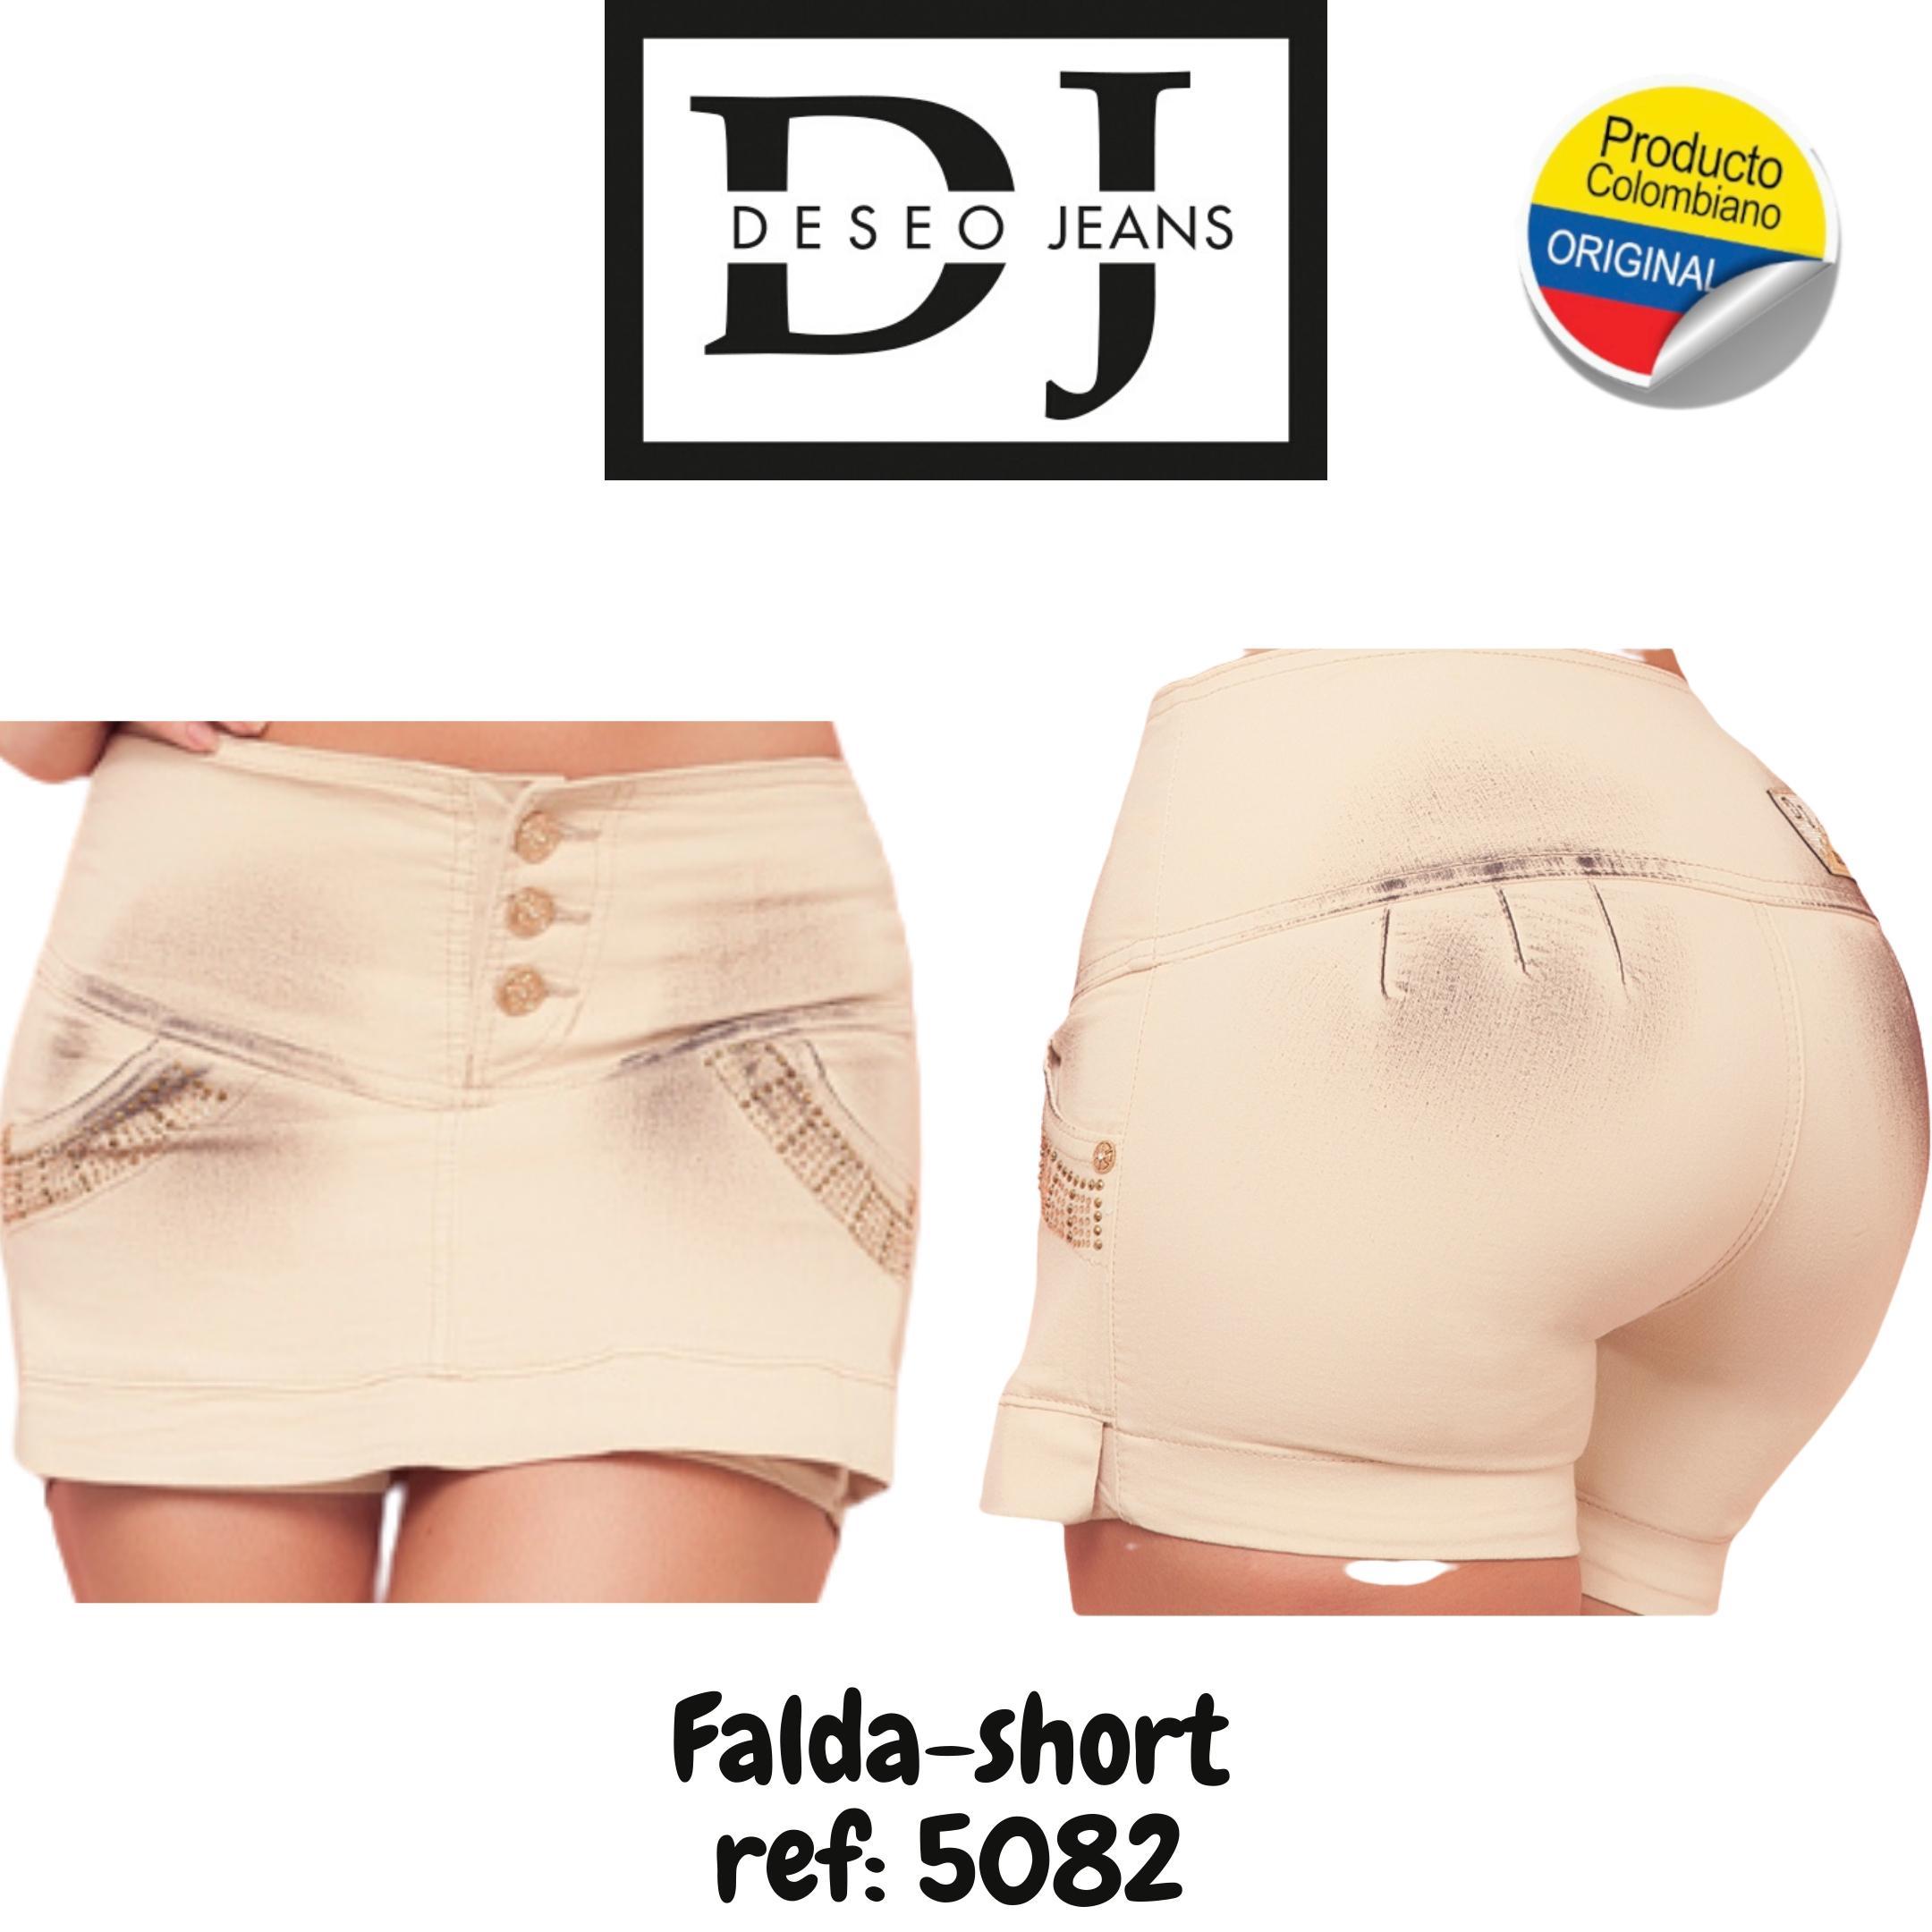 Falda-Short Deseo